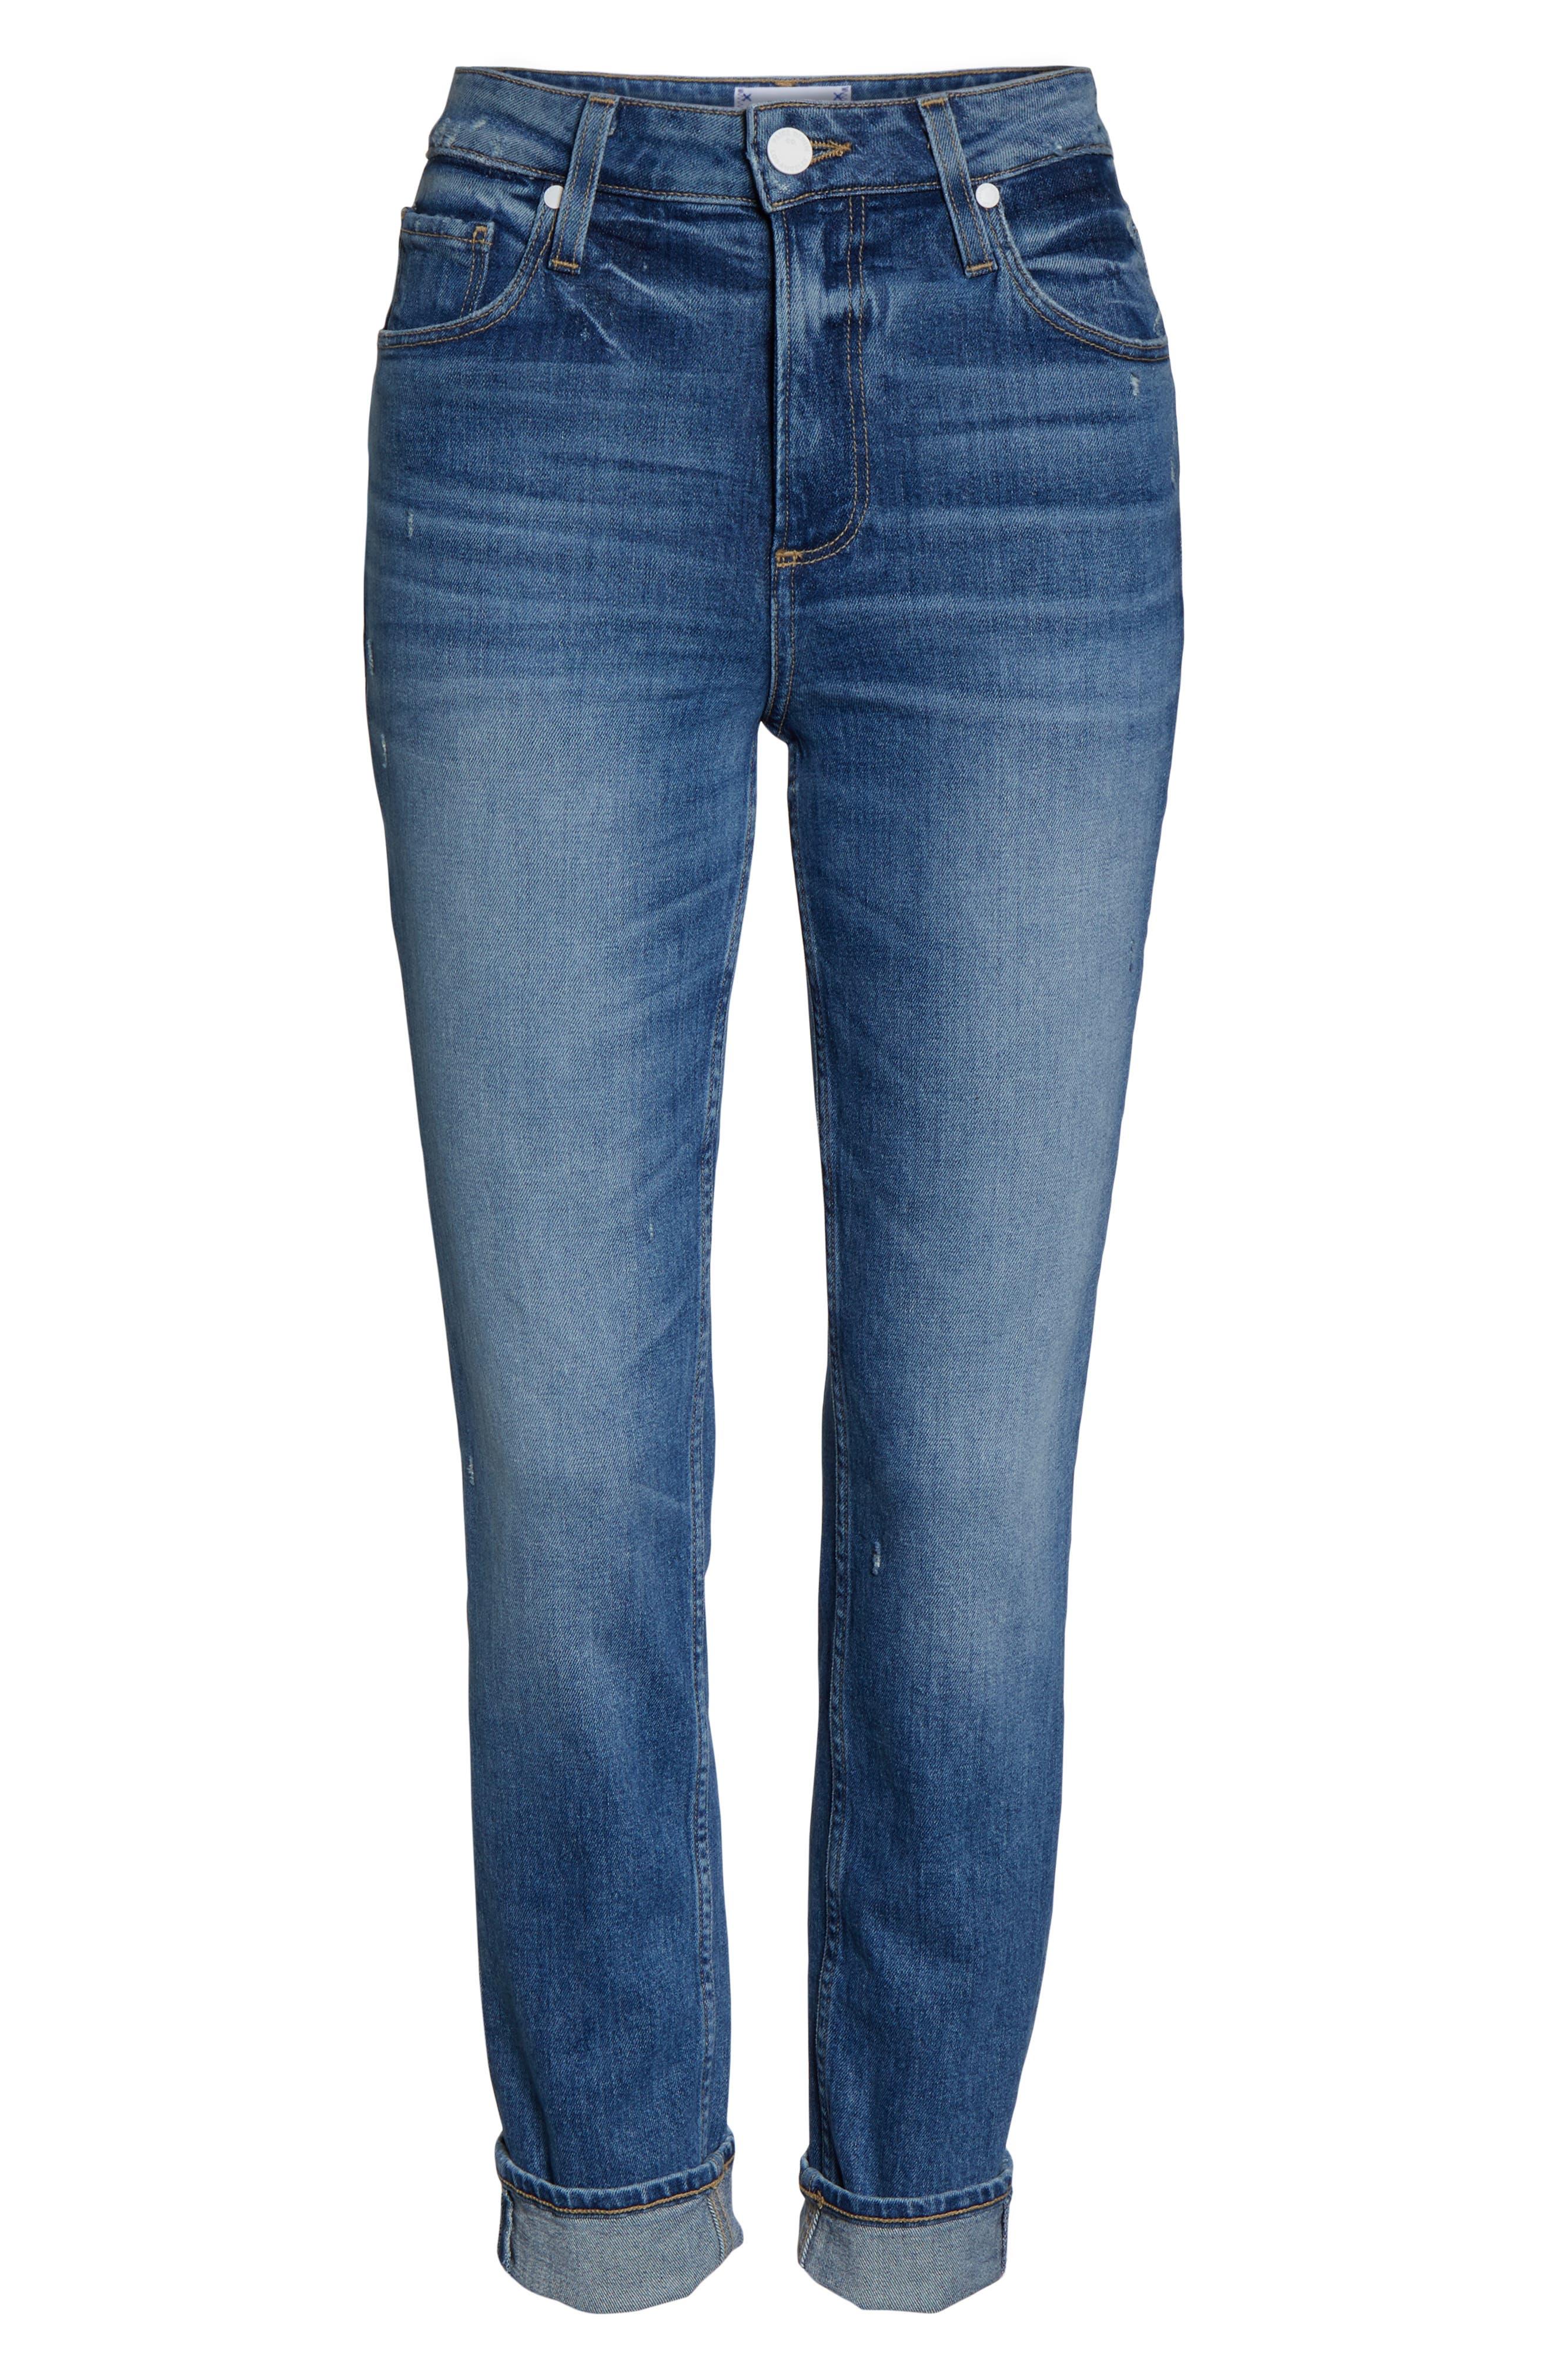 Sarah High Waist Straight Slim Leg Jeans,                             Alternate thumbnail 6, color,                             EMBARCADERO